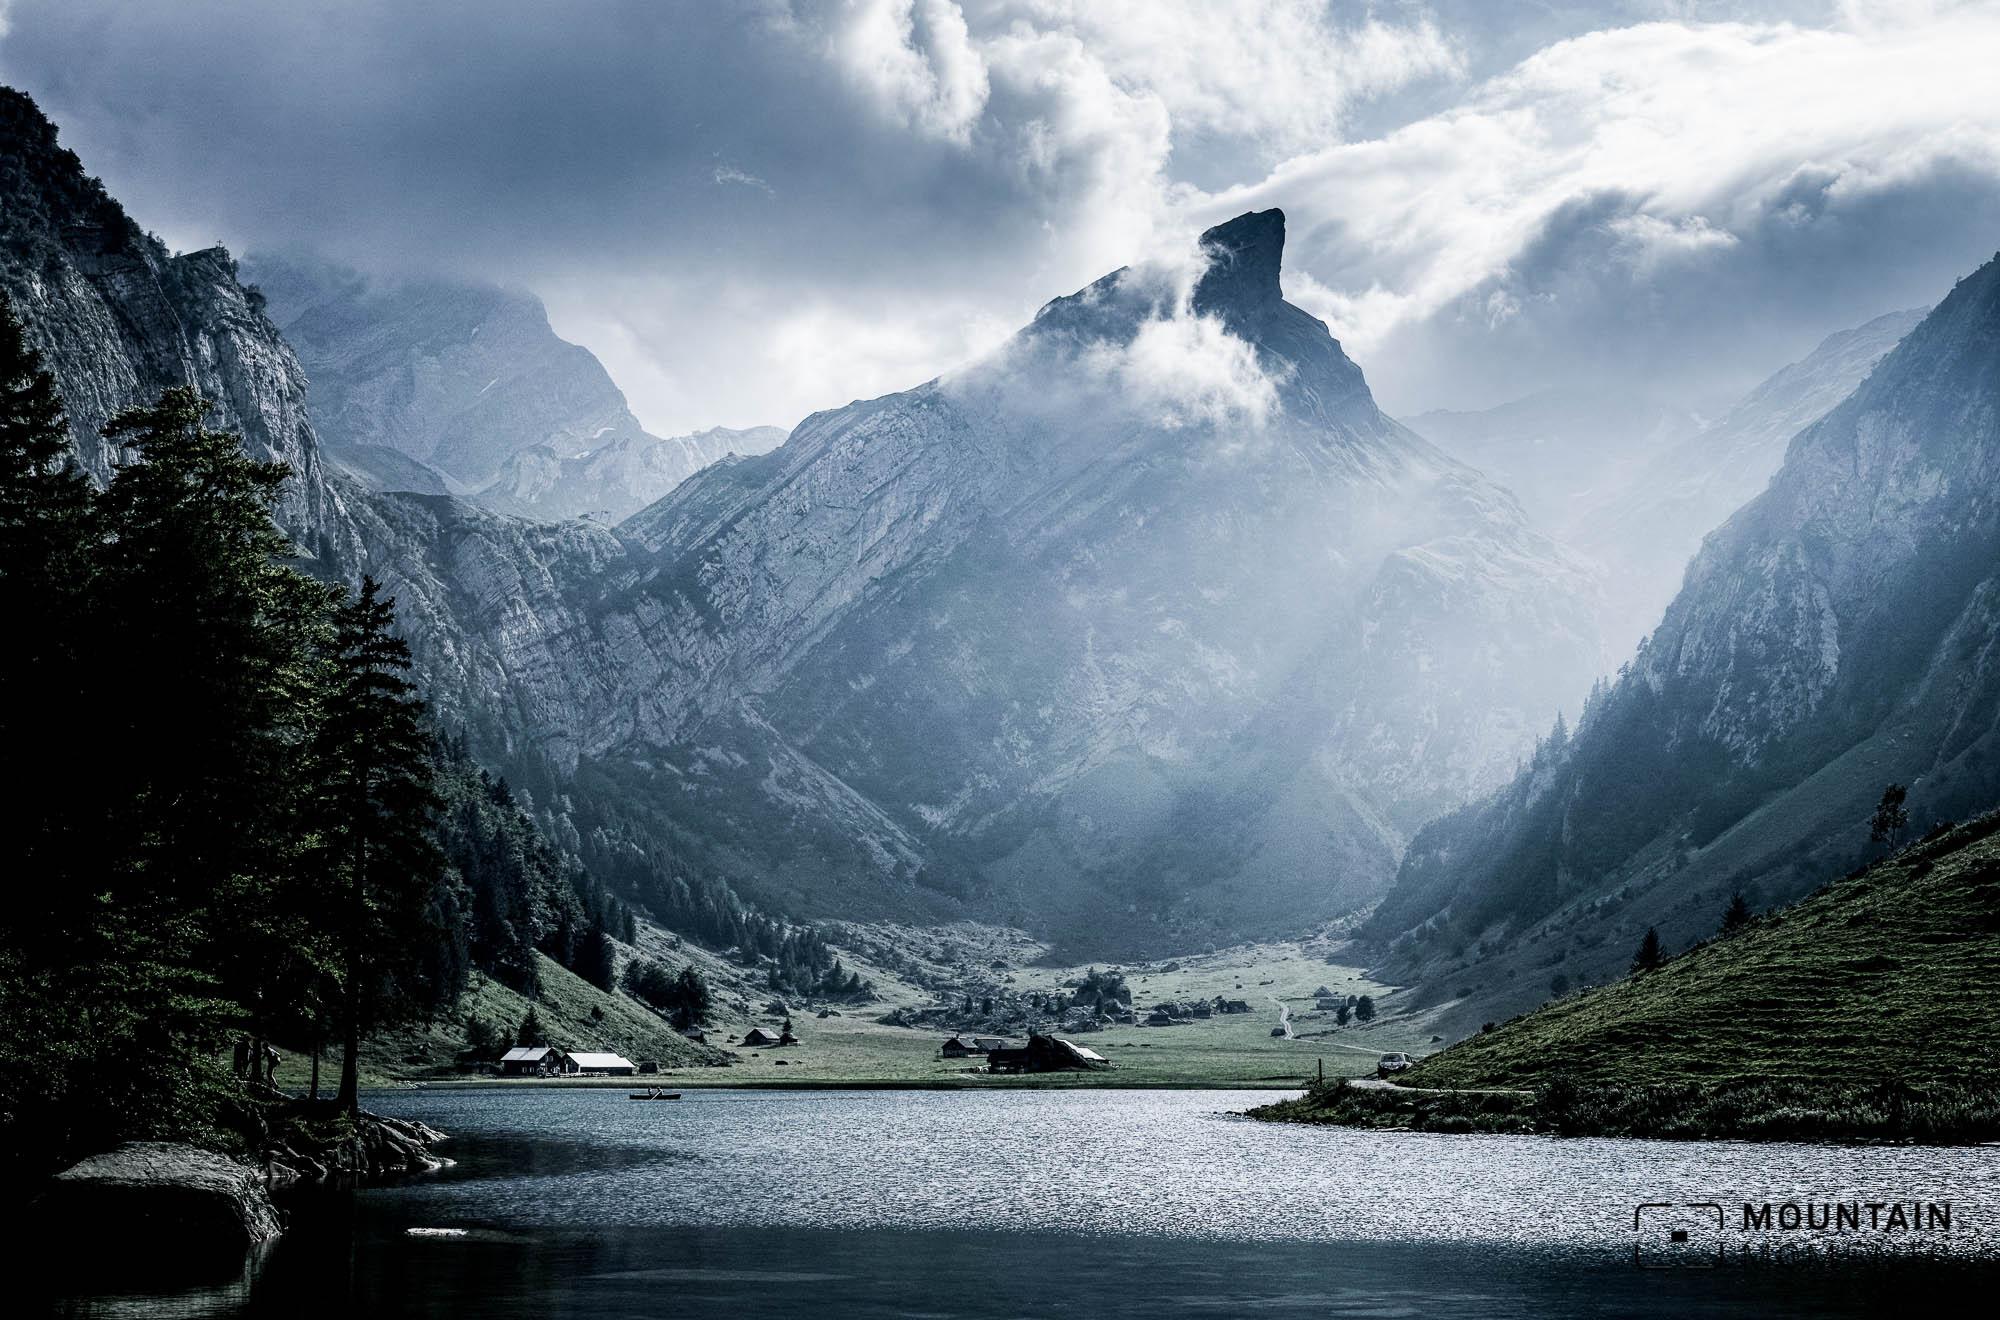 landschaftsfotografie tipps, landschaftsfotografie